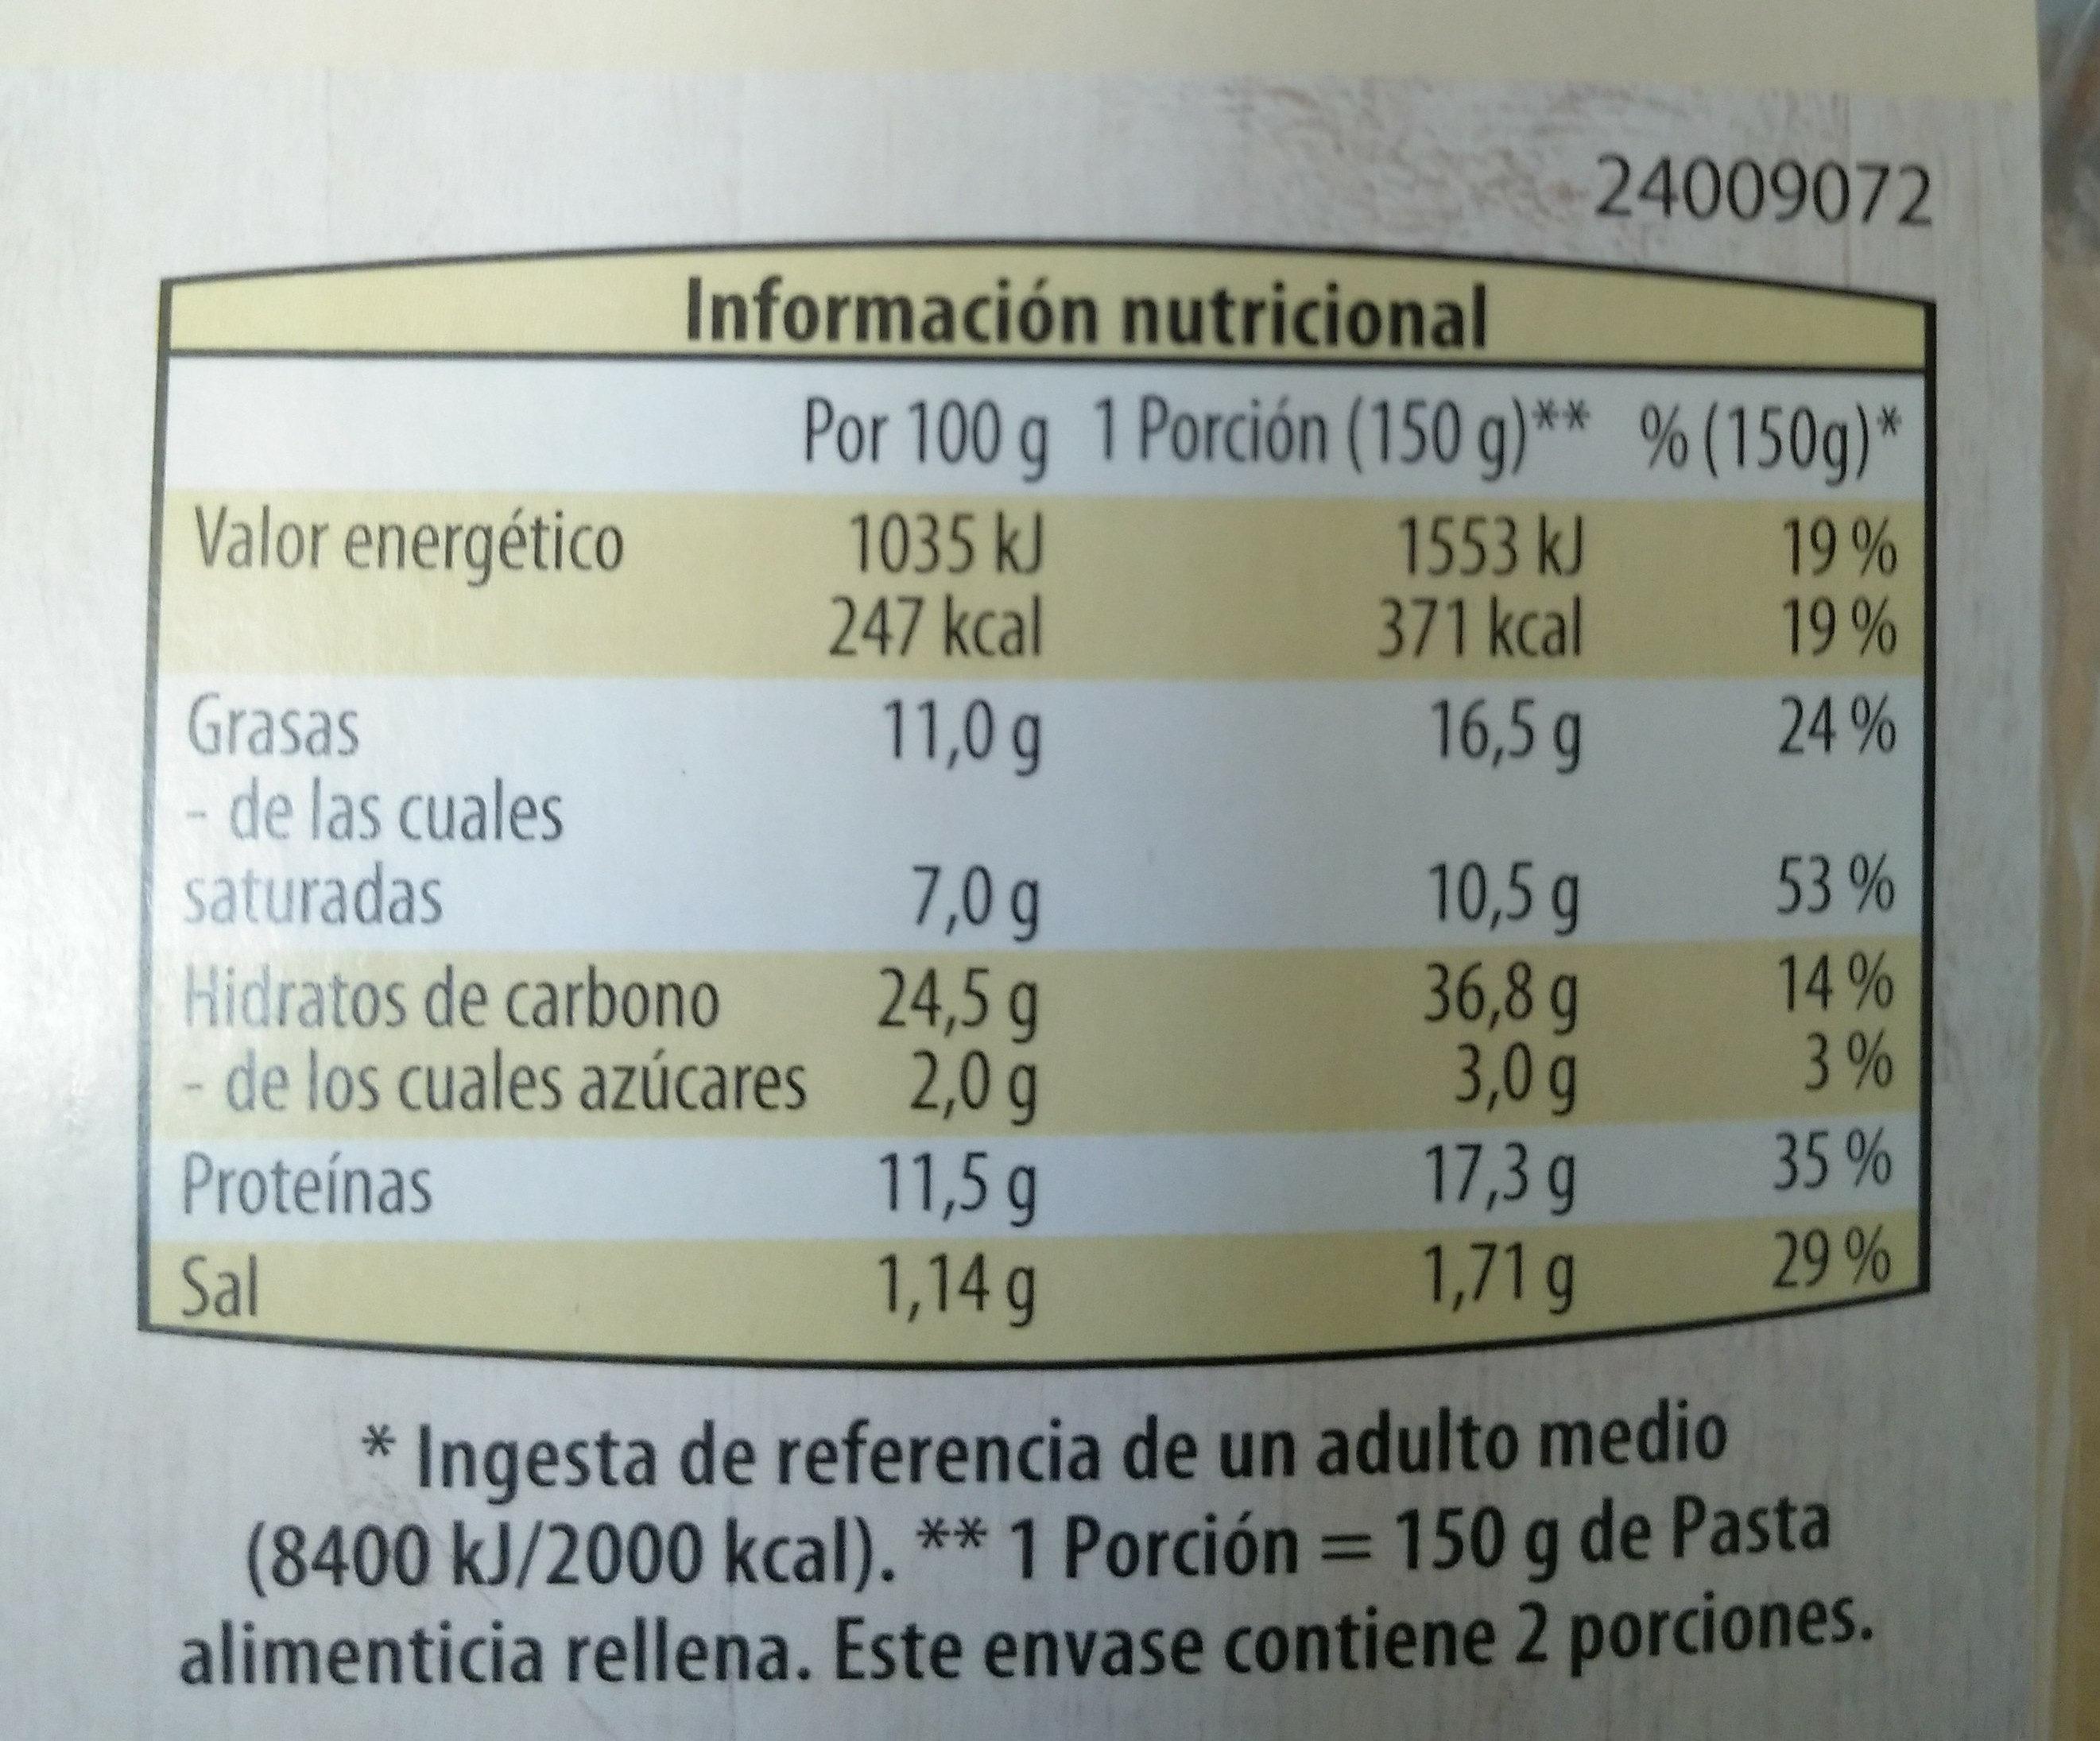 Tortelli con pimiento morron y guindilla. - Nutrition facts